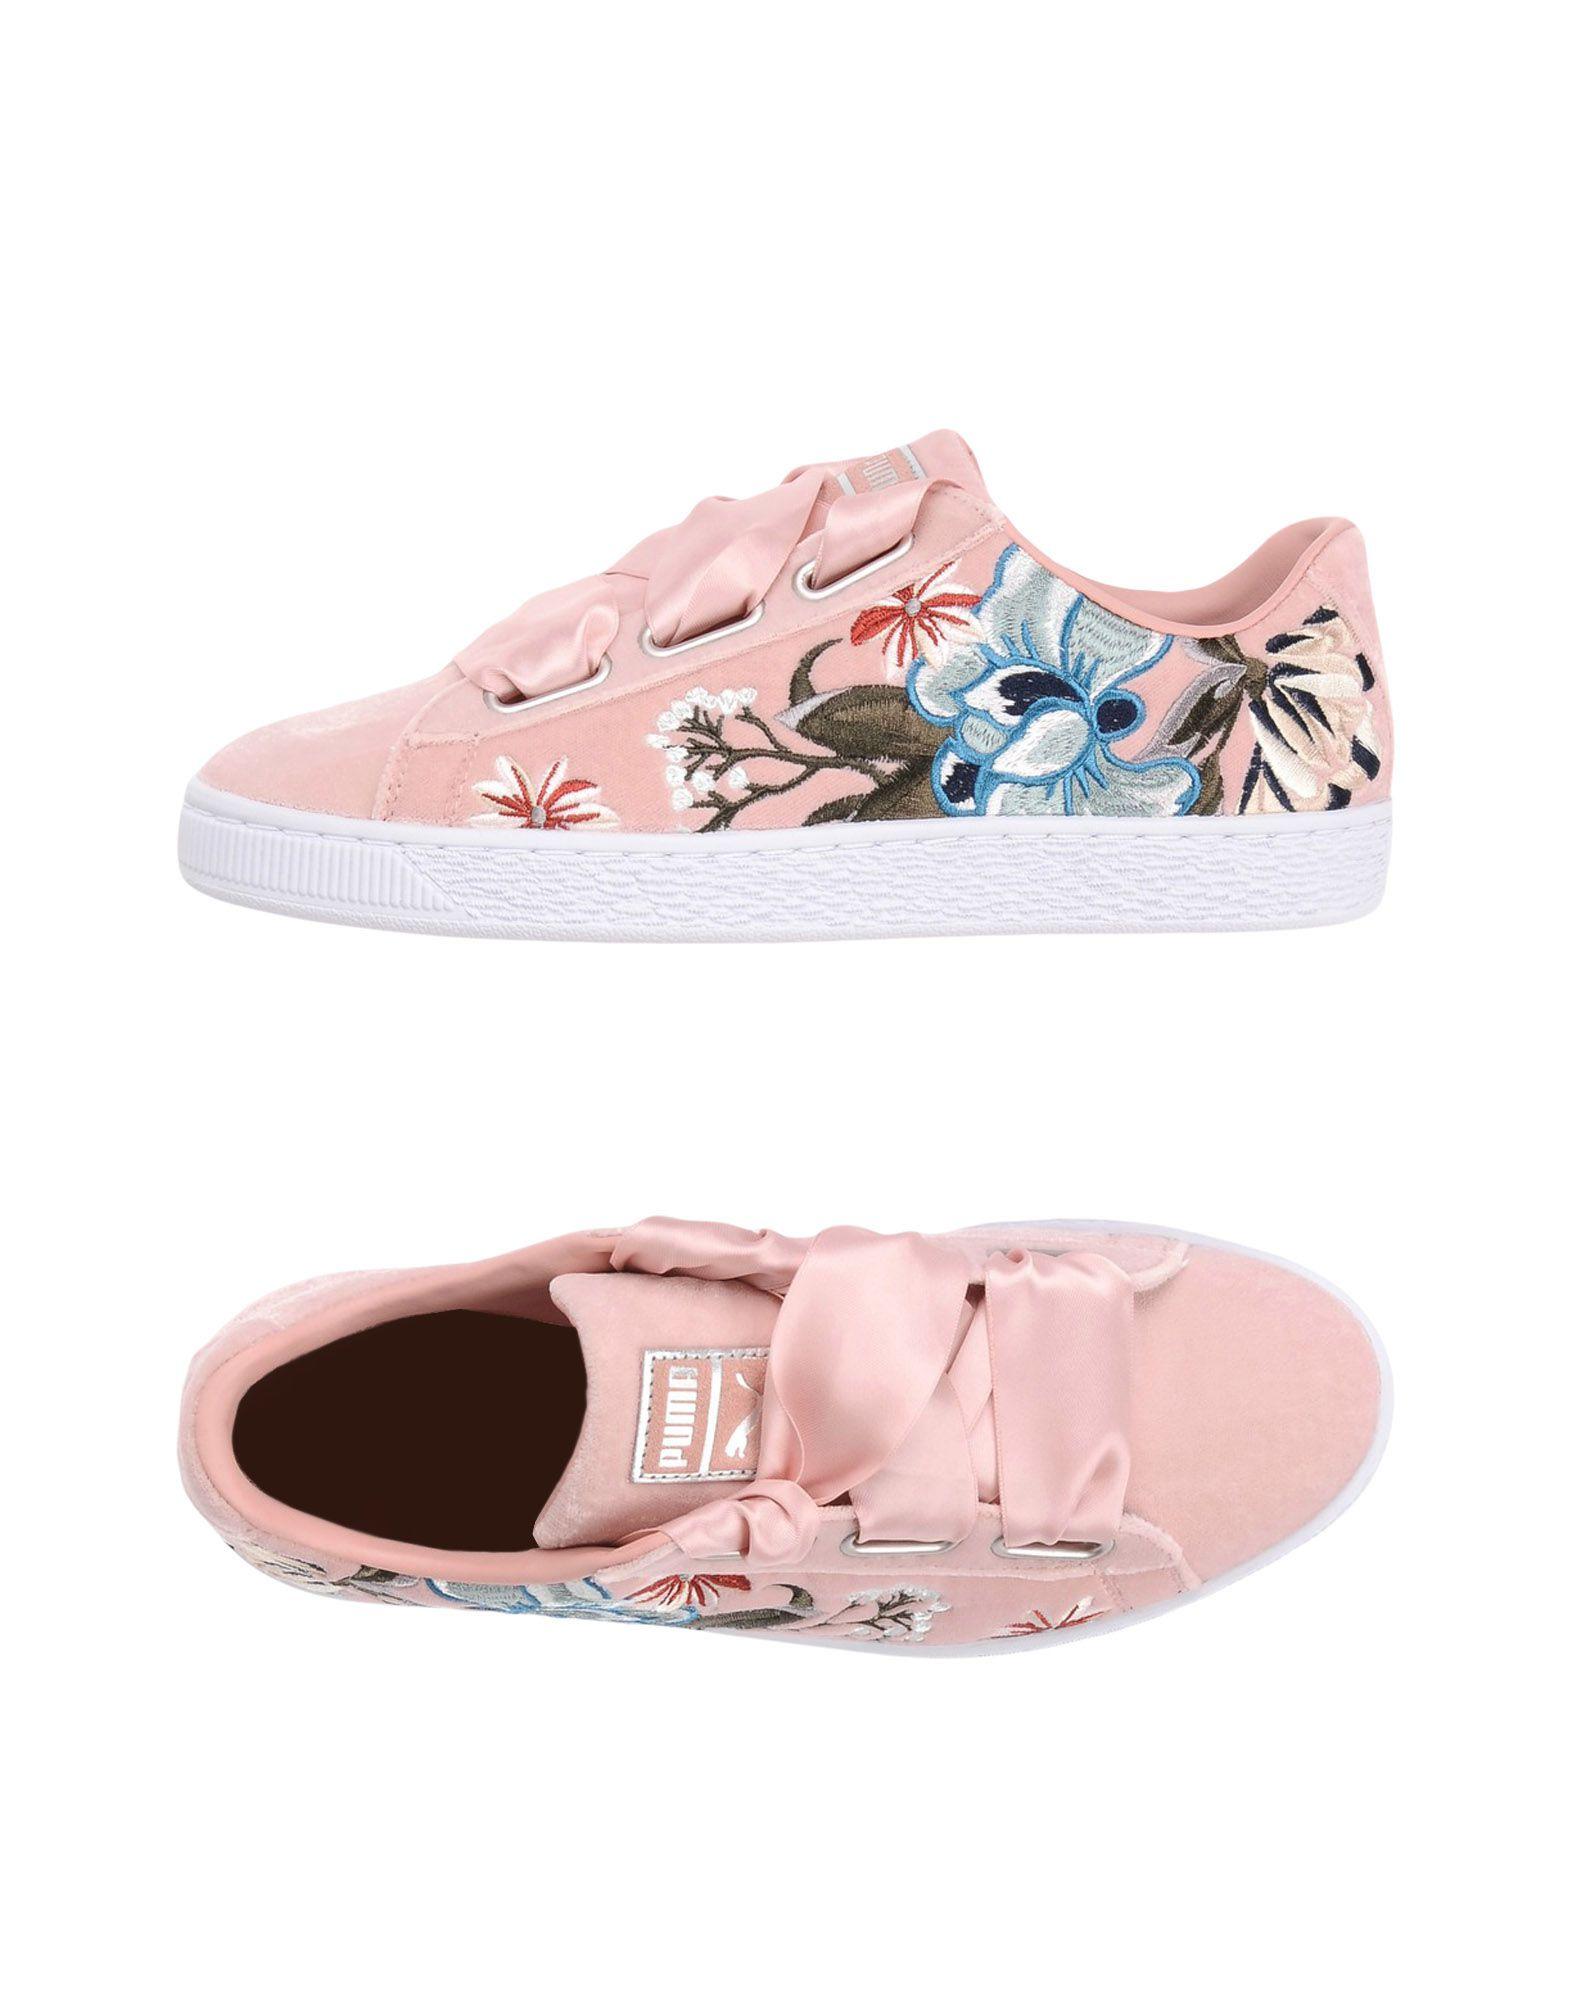 timeless design 7ef73 31a47 PUMA Sneakers - Footwear D | YOOX.COM